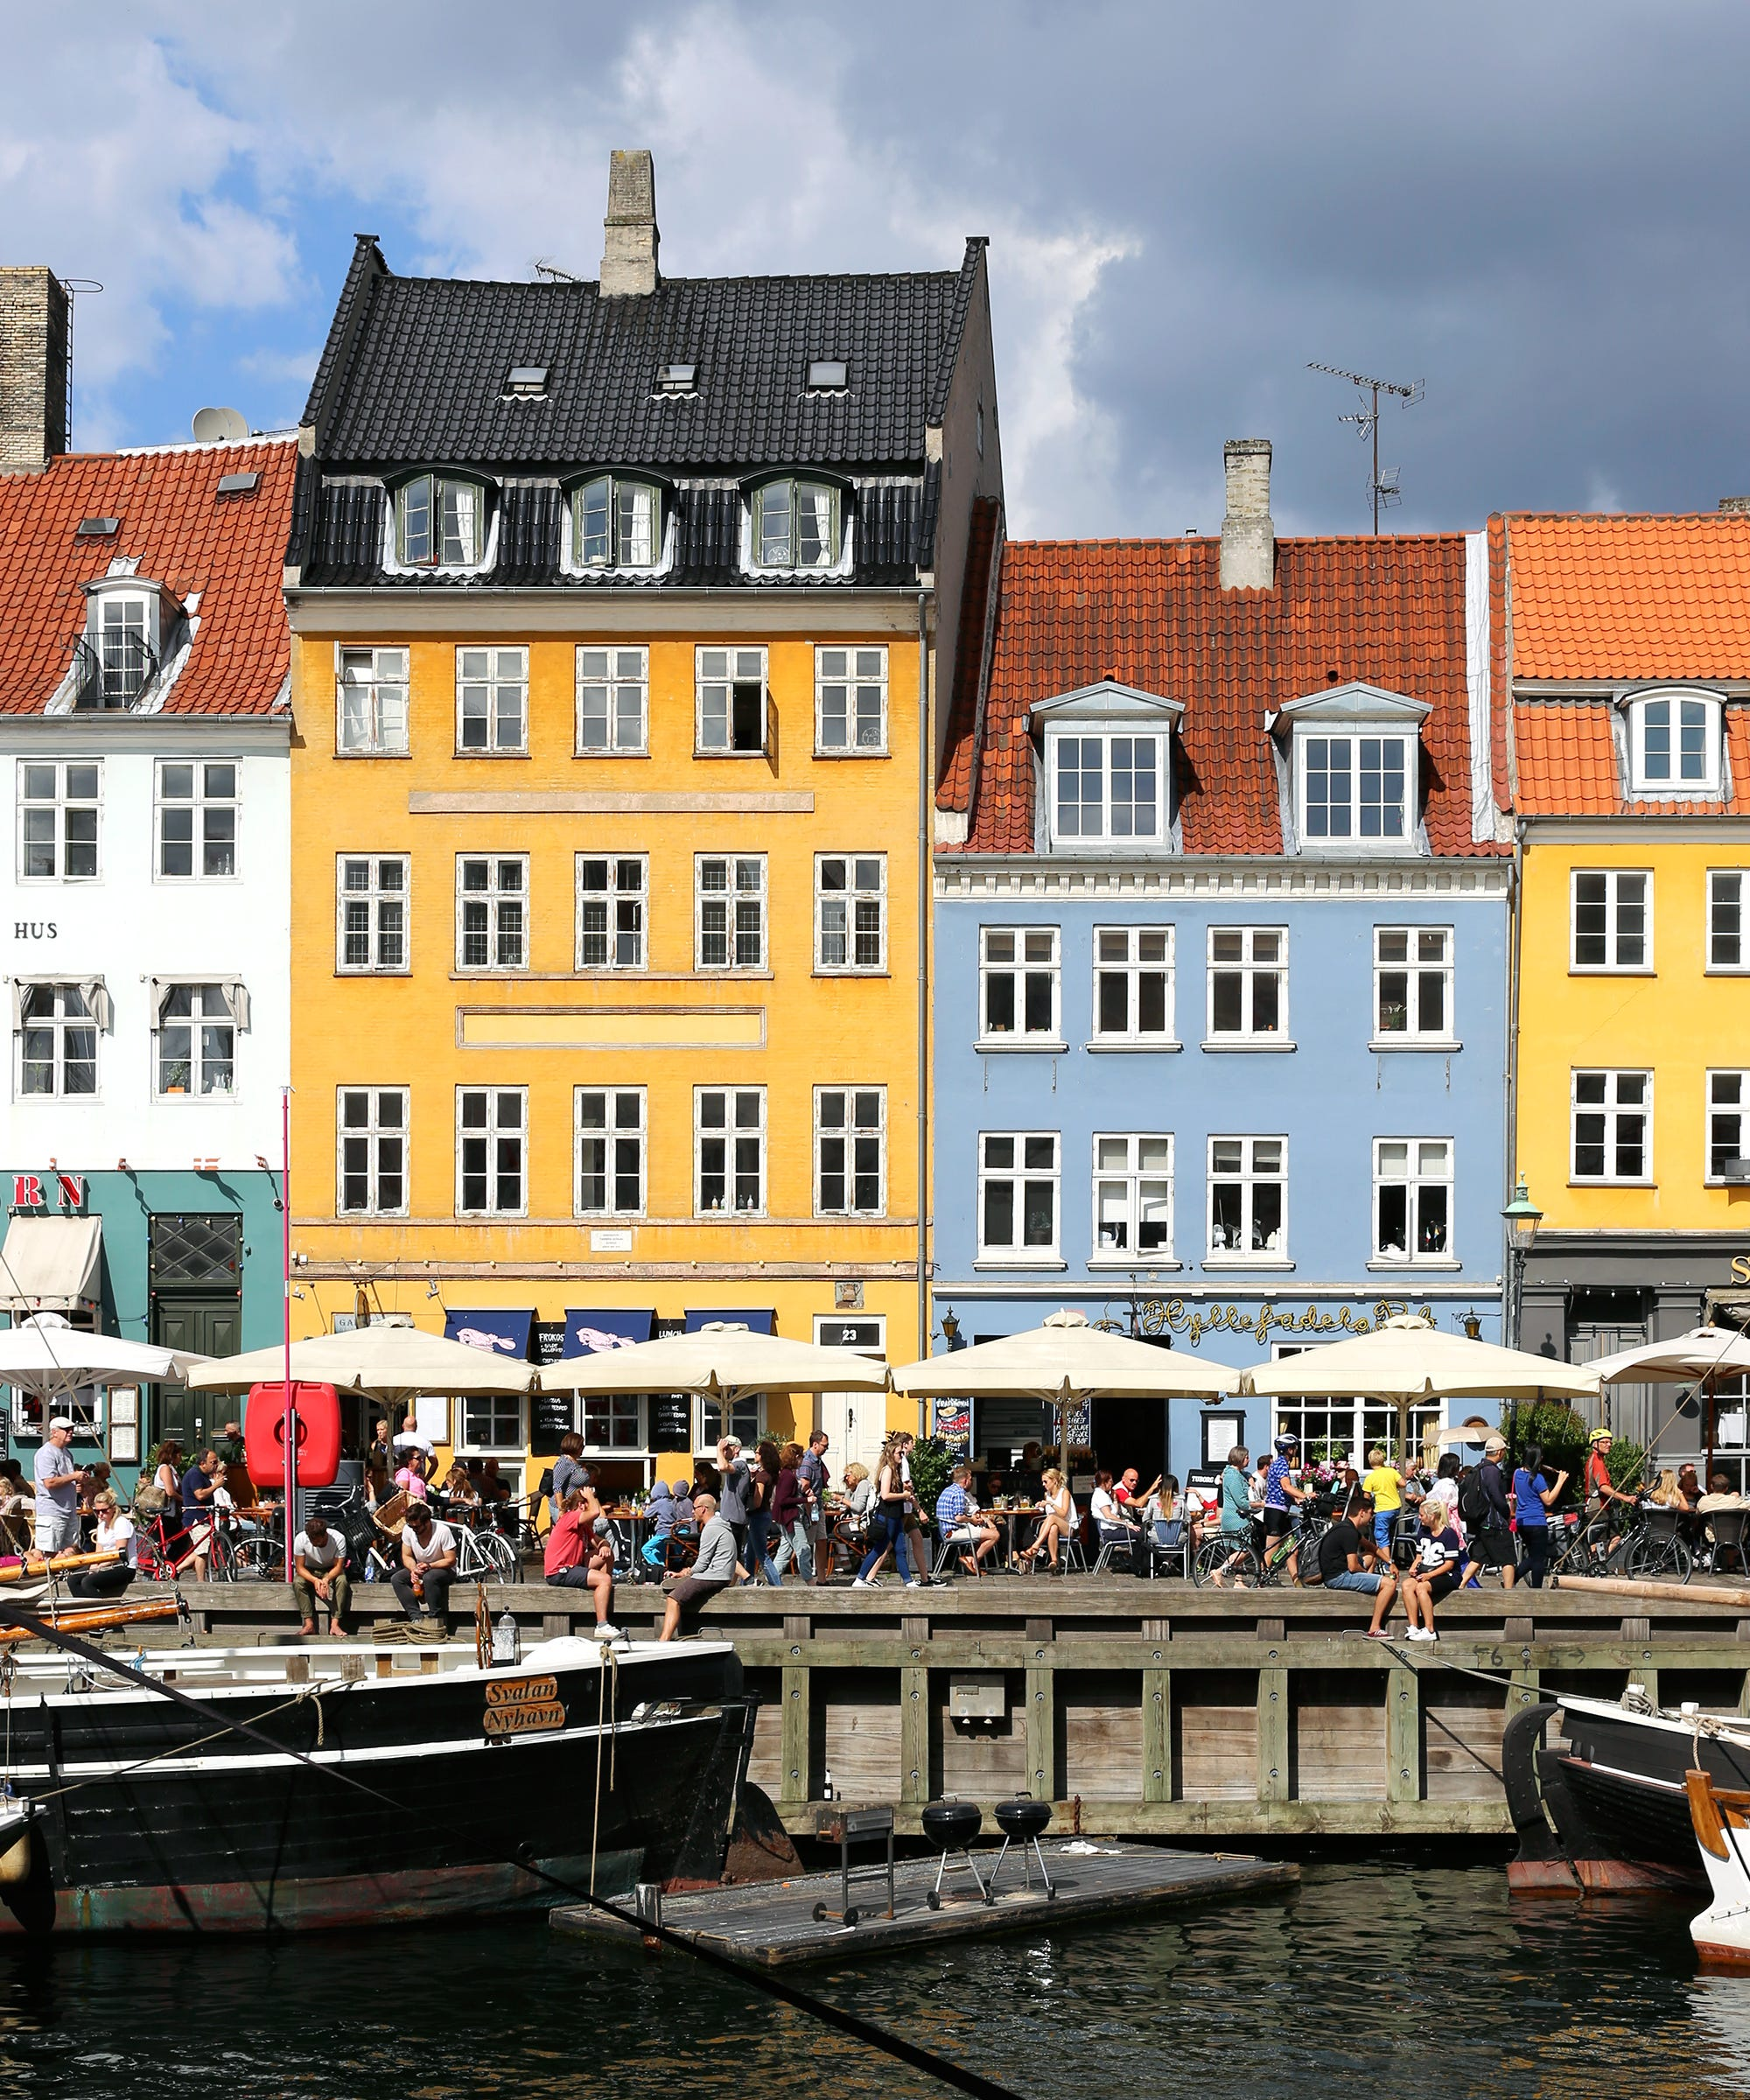 denmark sweden vacation travel plan - global honeymoon